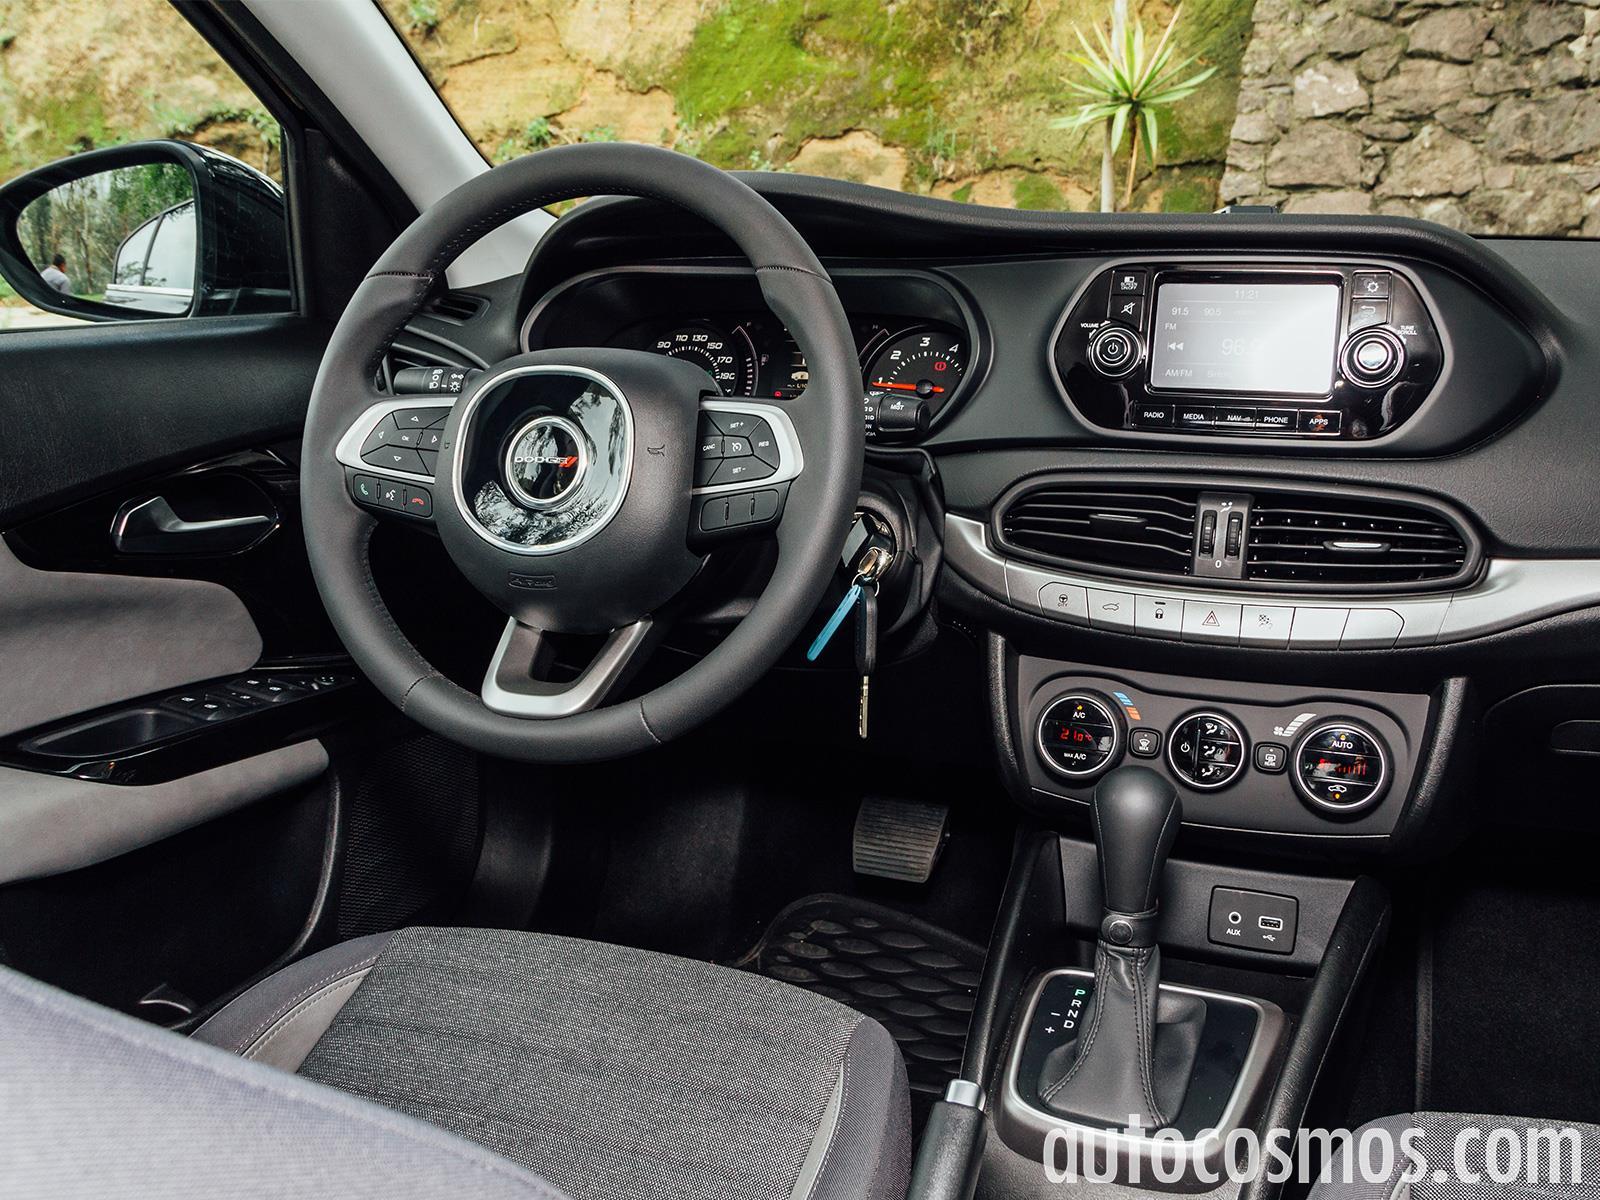 Dodge Neon 2017 a prueba - Autocosmos.com